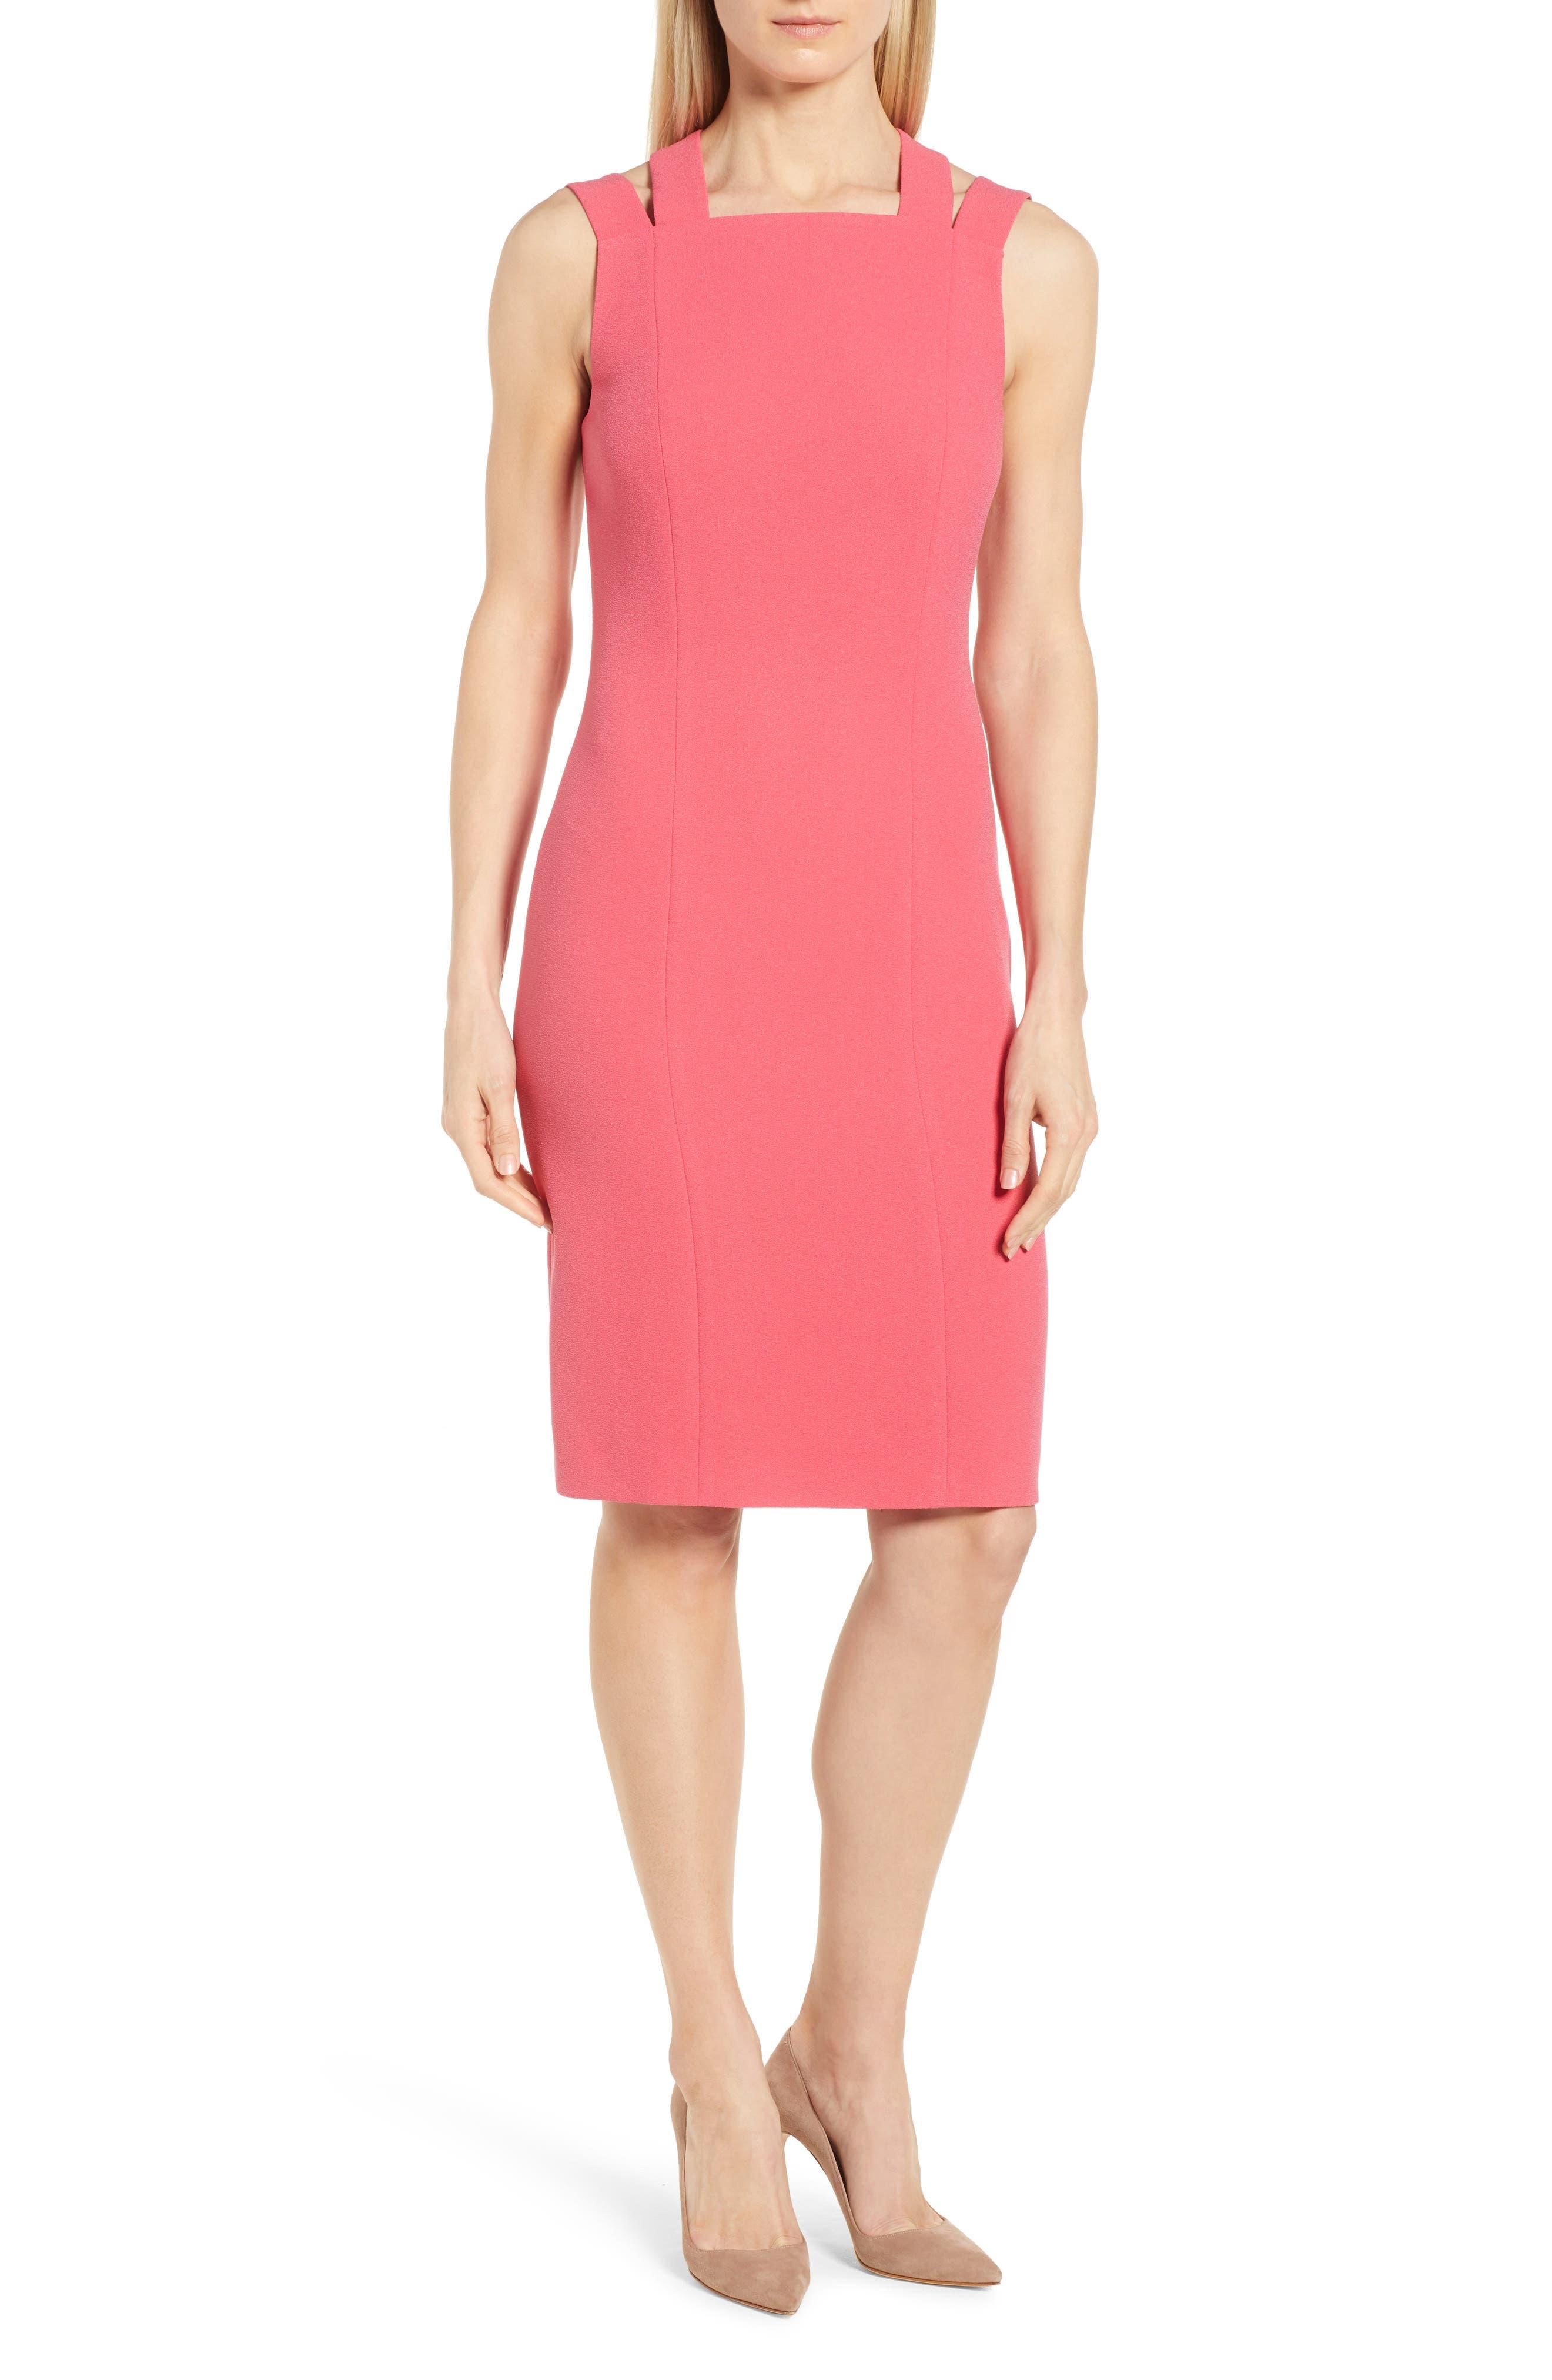 Daphima Compact Crepe Sheath Dress,                             Main thumbnail 1, color,                             692